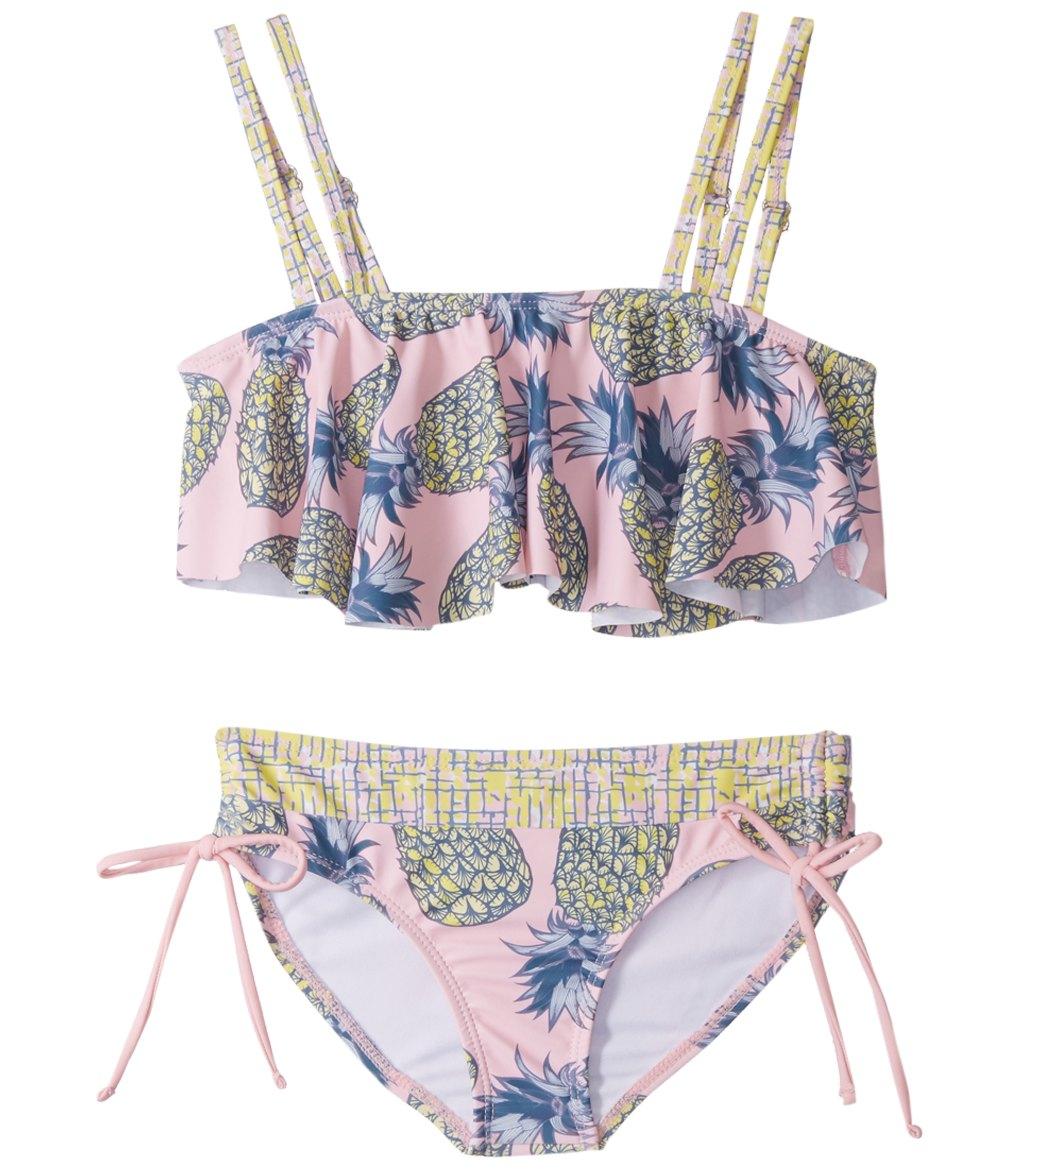 f93a52477aeab Limeapple Girls' Sweet Sunsations Printed Ruffle Bikini Set (Little Kid,  Big Kid) at SwimOutlet.com